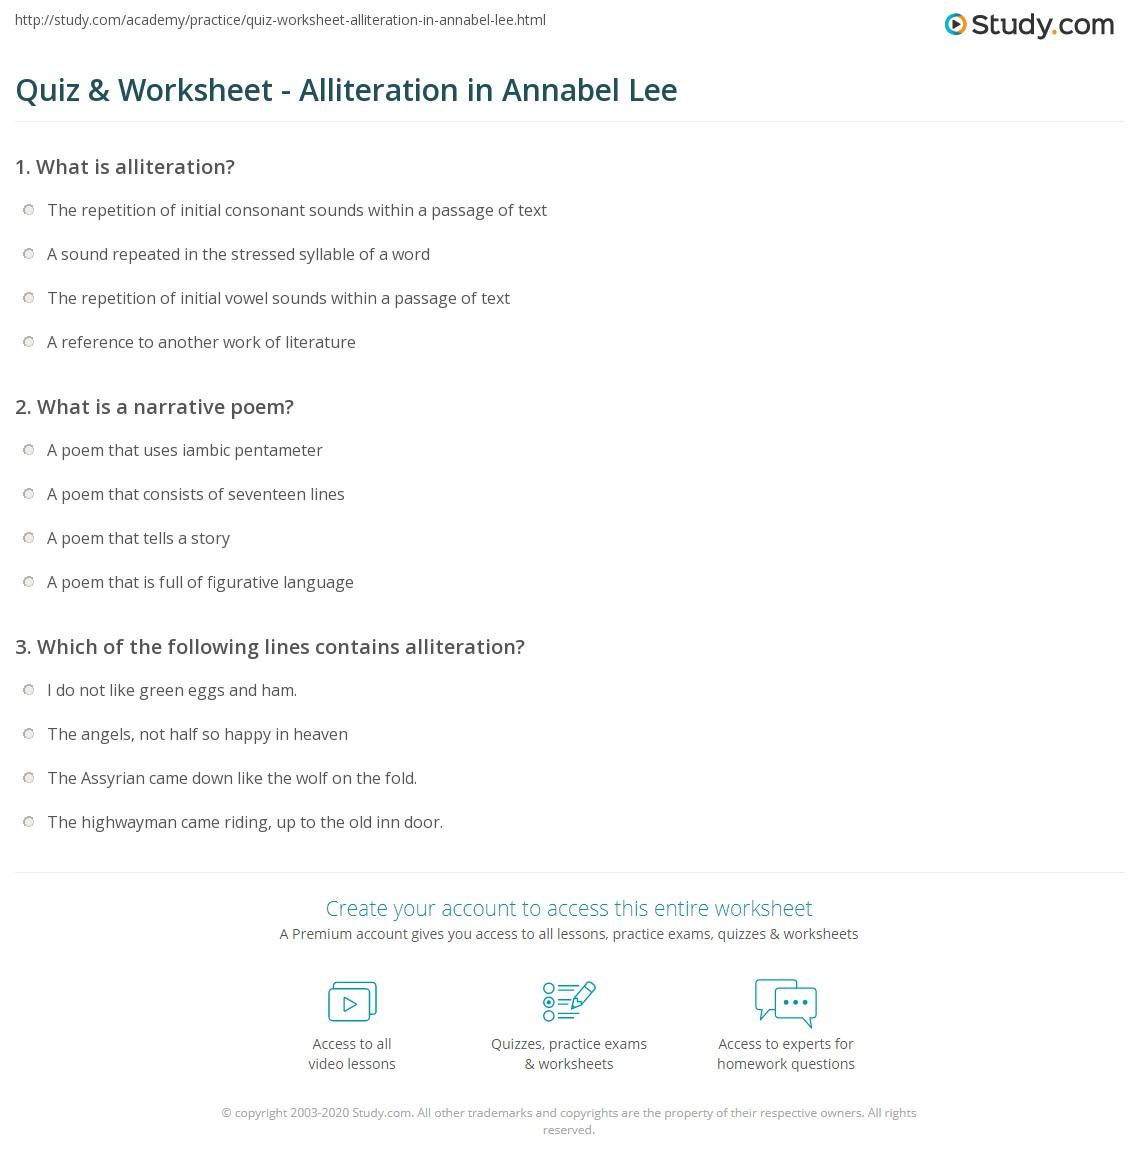 hight resolution of Quiz \u0026 Worksheet - Alliteration in Annabel Lee   Study.com